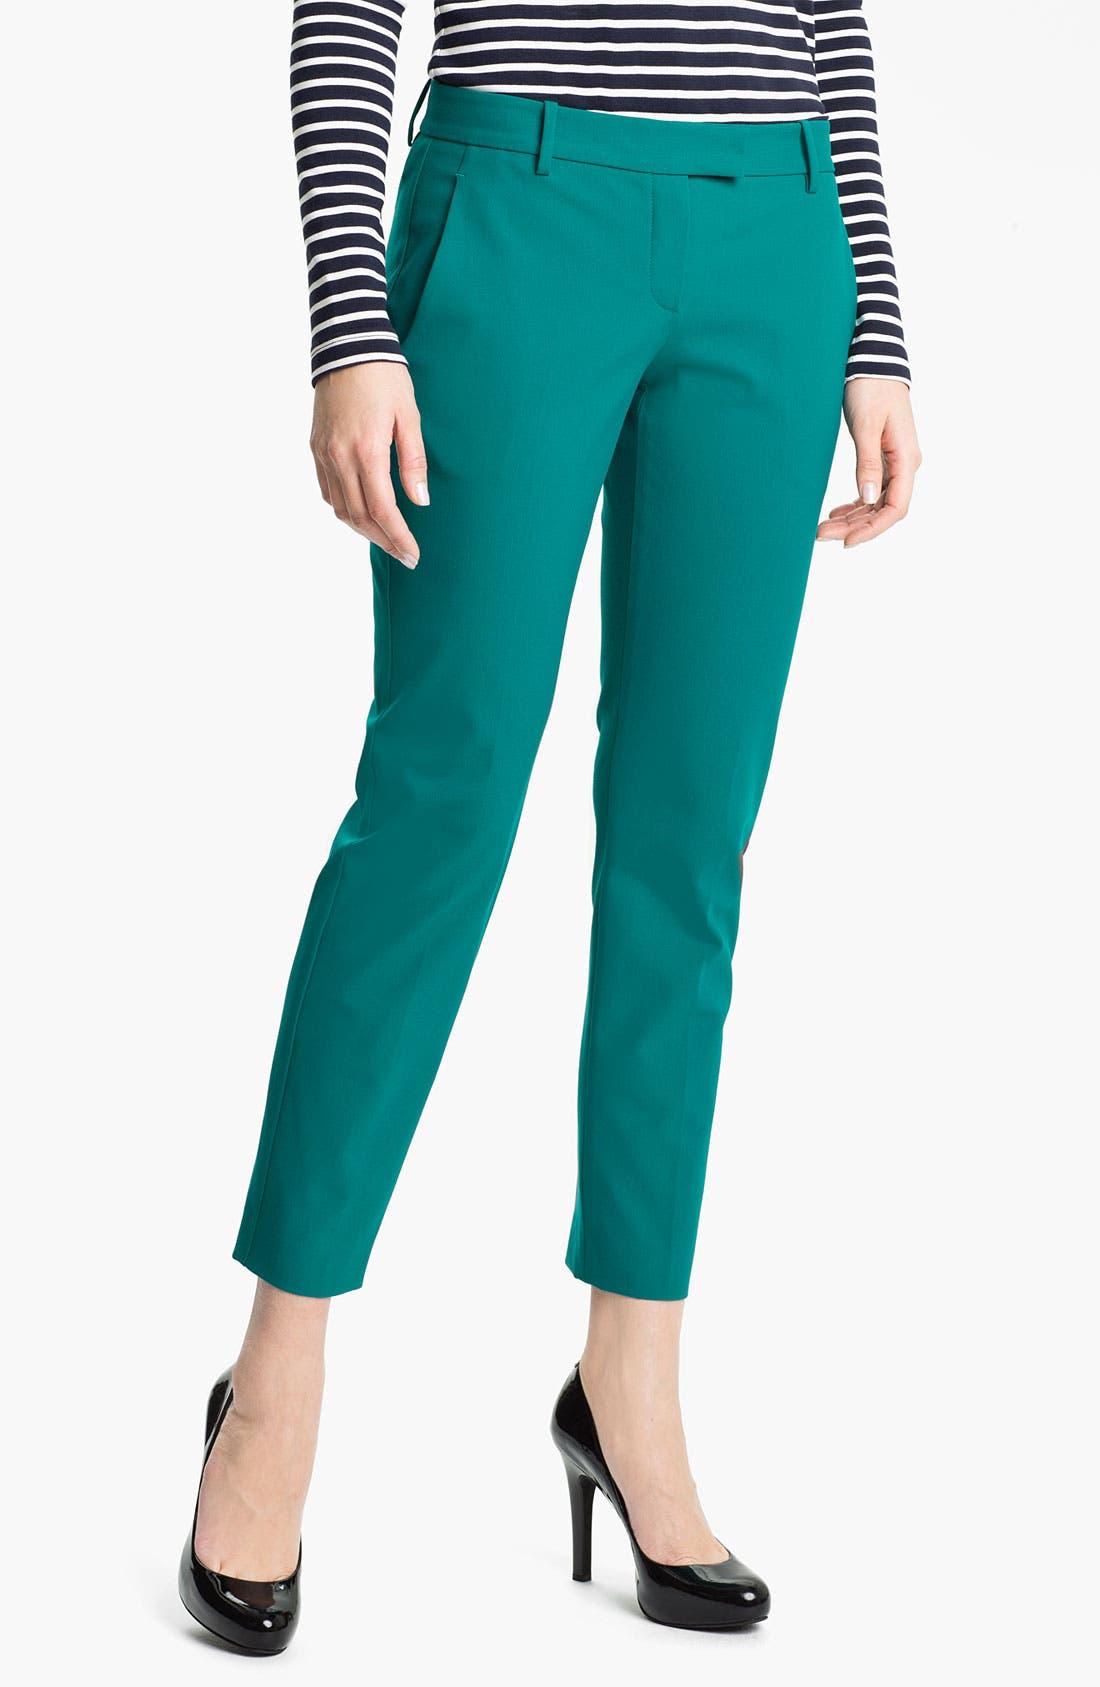 Alternate Image 1 Selected - Theory 'Sienna' Crop Pants